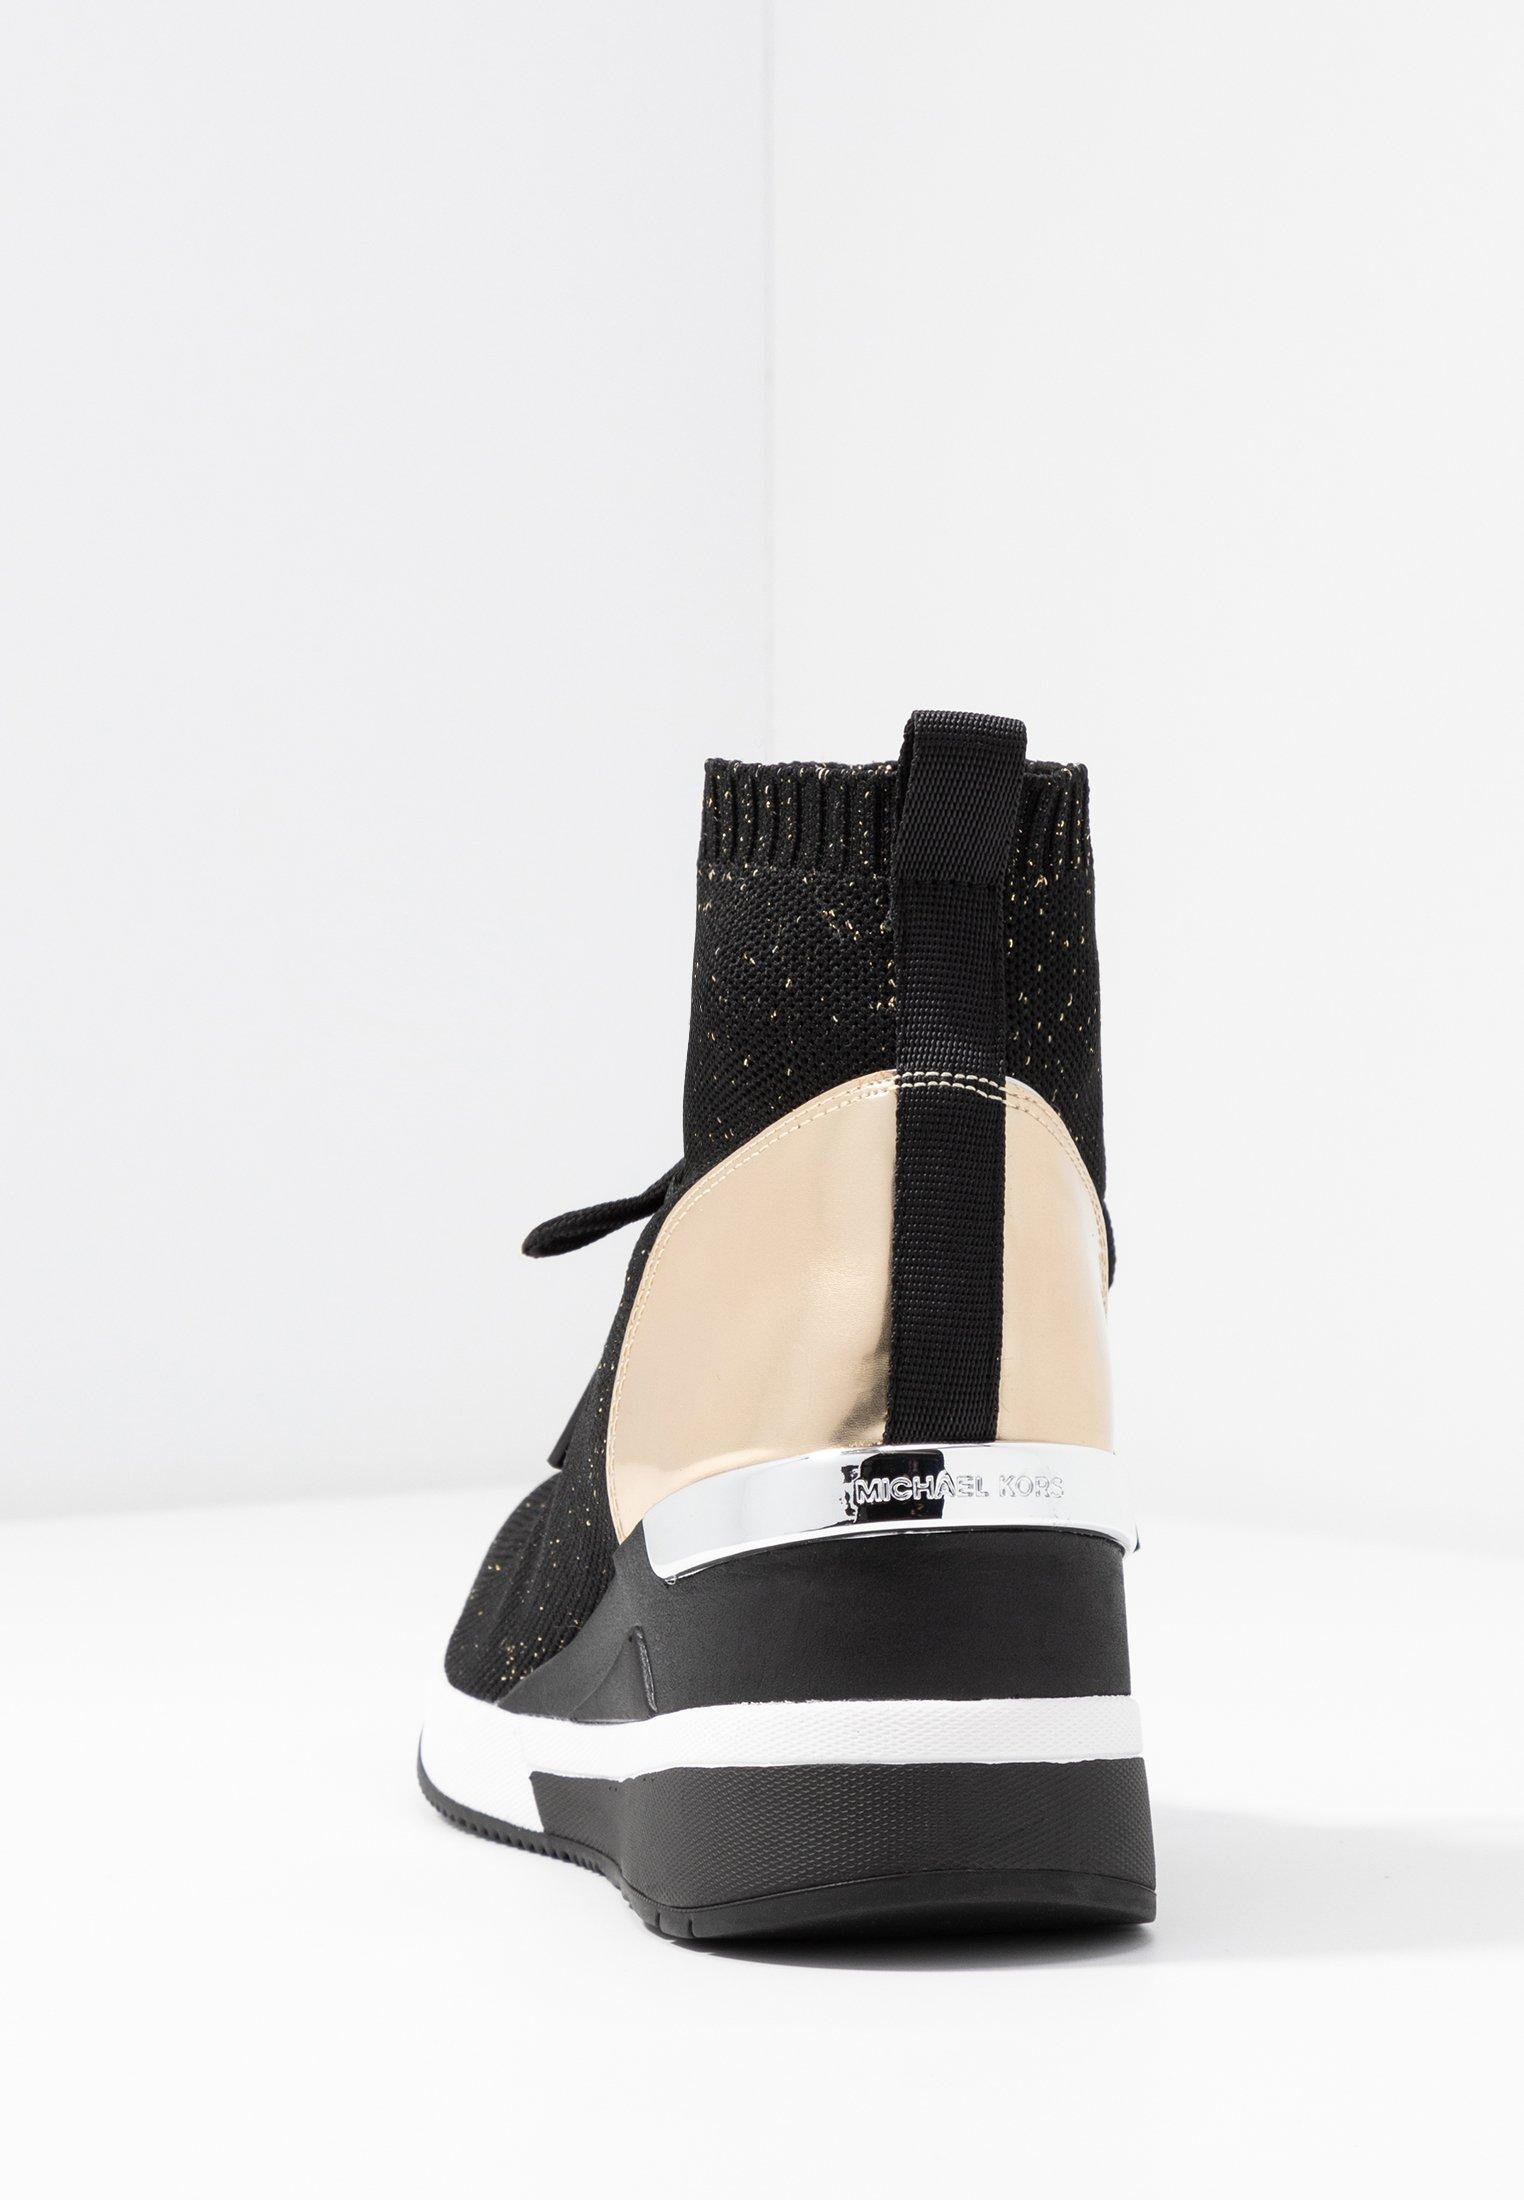 Baskets Michael Kors : Achetez jusqu'à −70% | Stylight